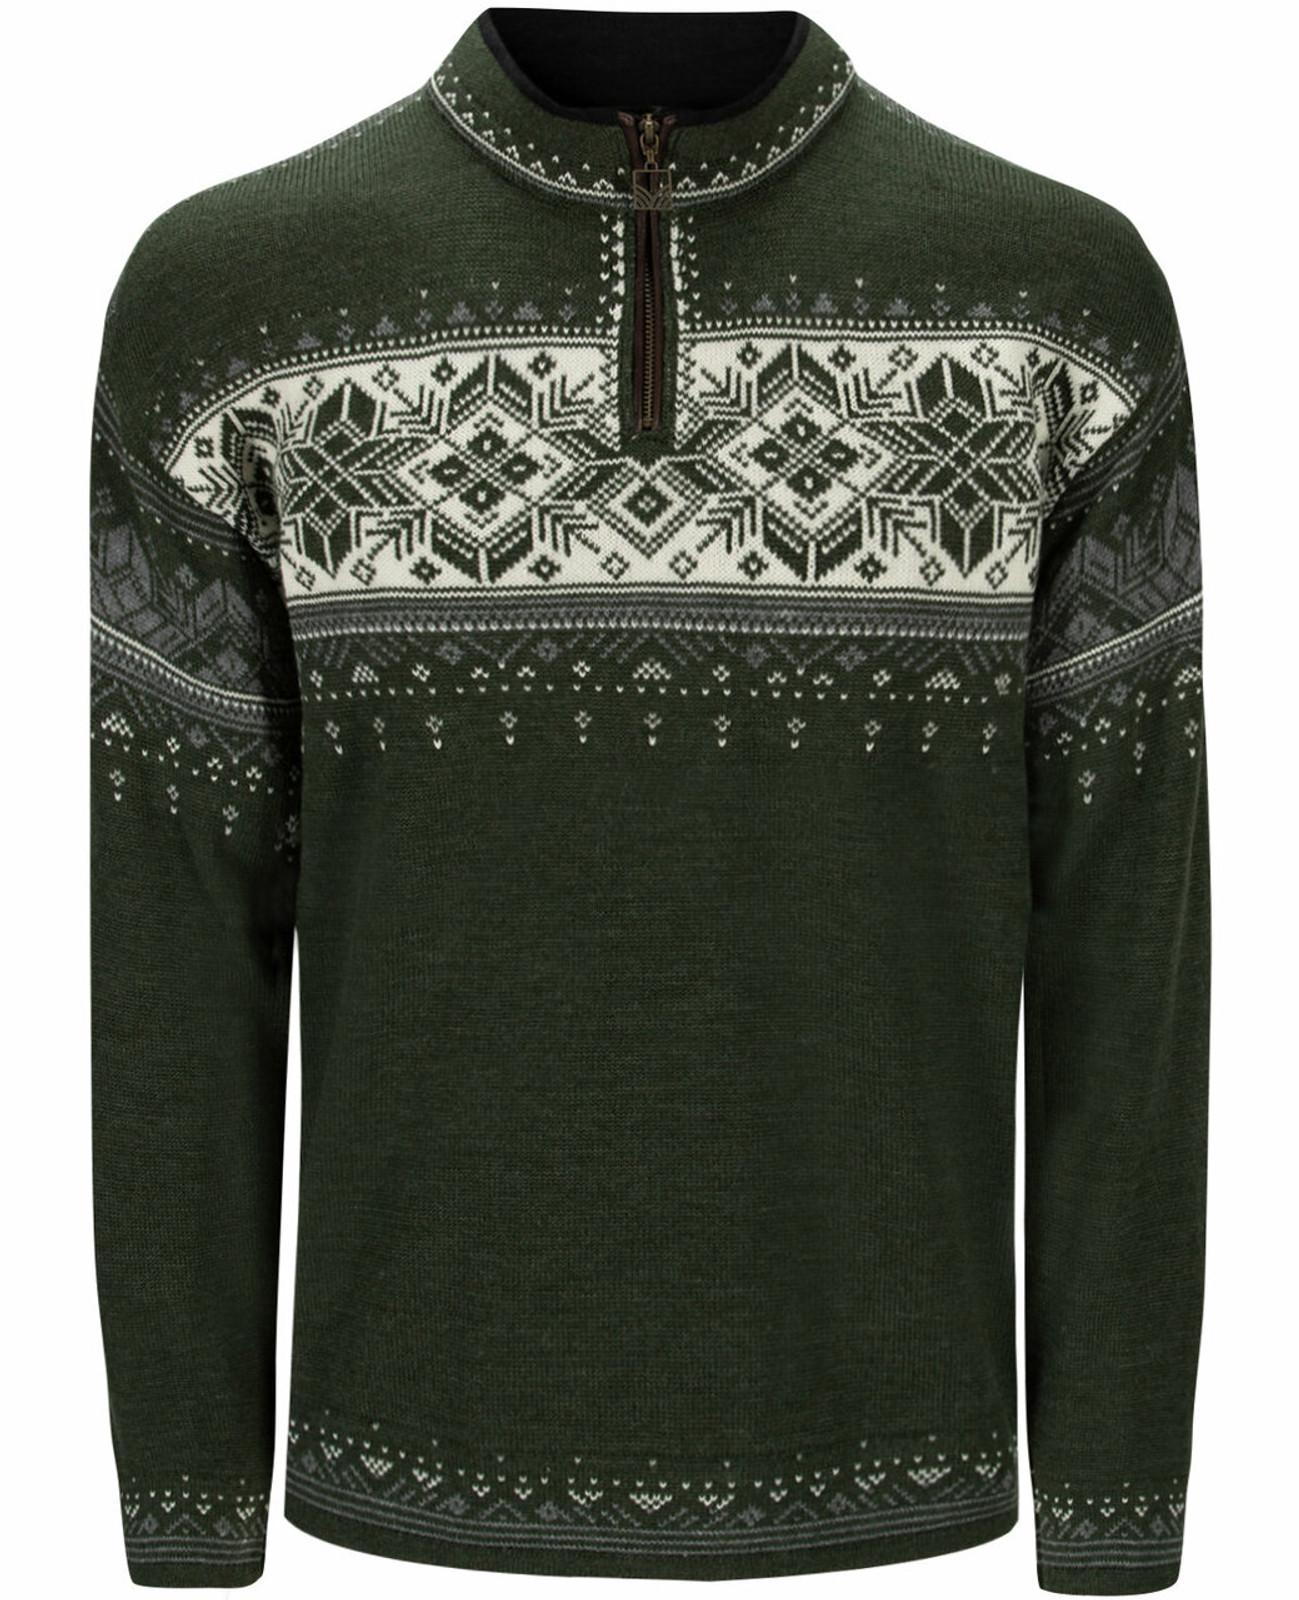 Dale of Norway Blyfjell Unisex Sweater, Dark Green/Smoke/Off White, 95021N